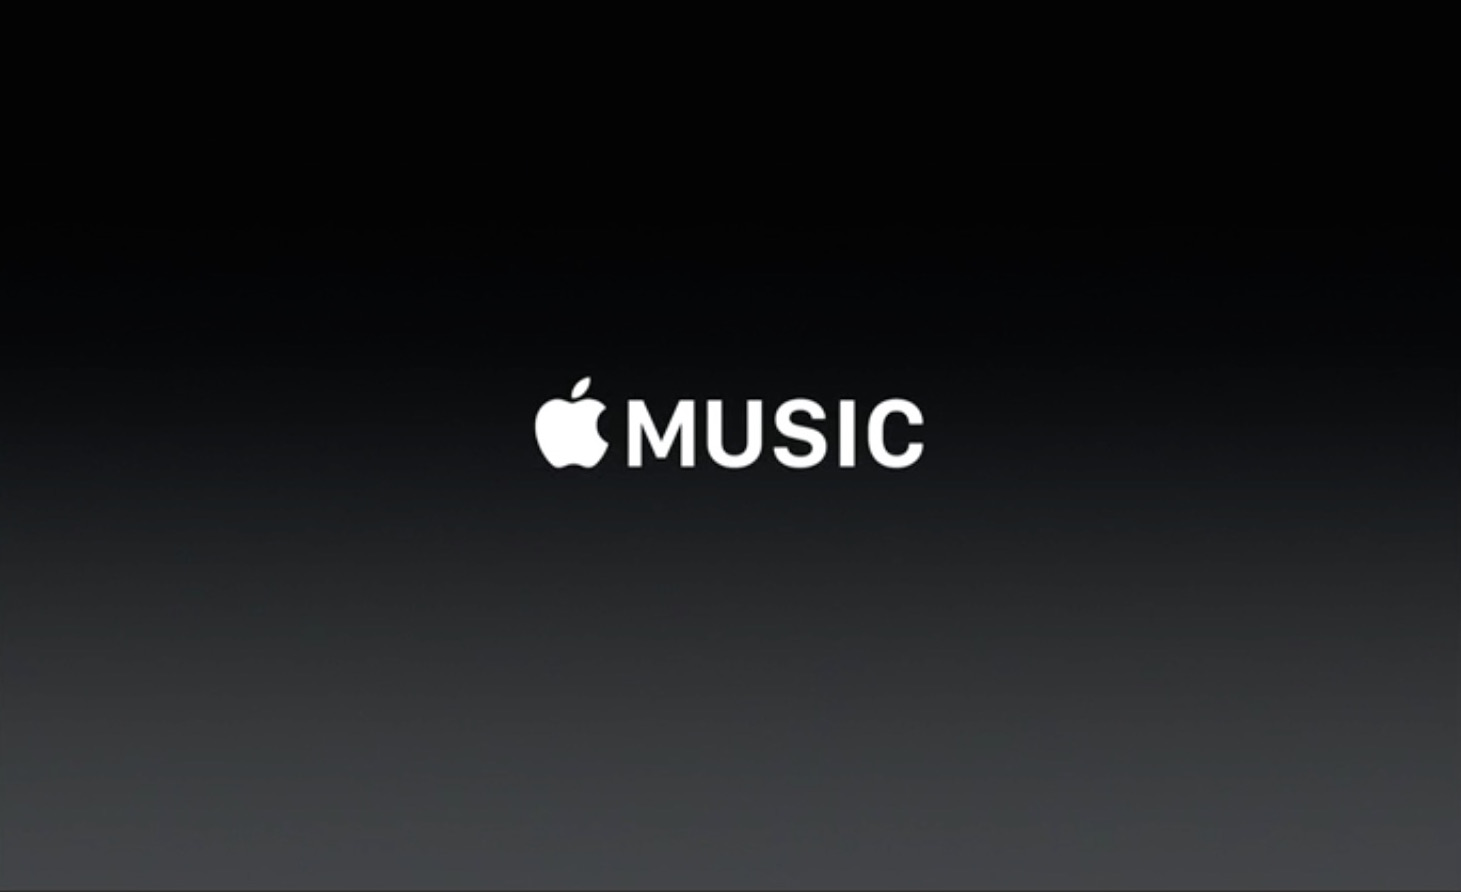 Apple Music、3ヶ月の無料期間がアダに?アーティストが楽曲提供中止